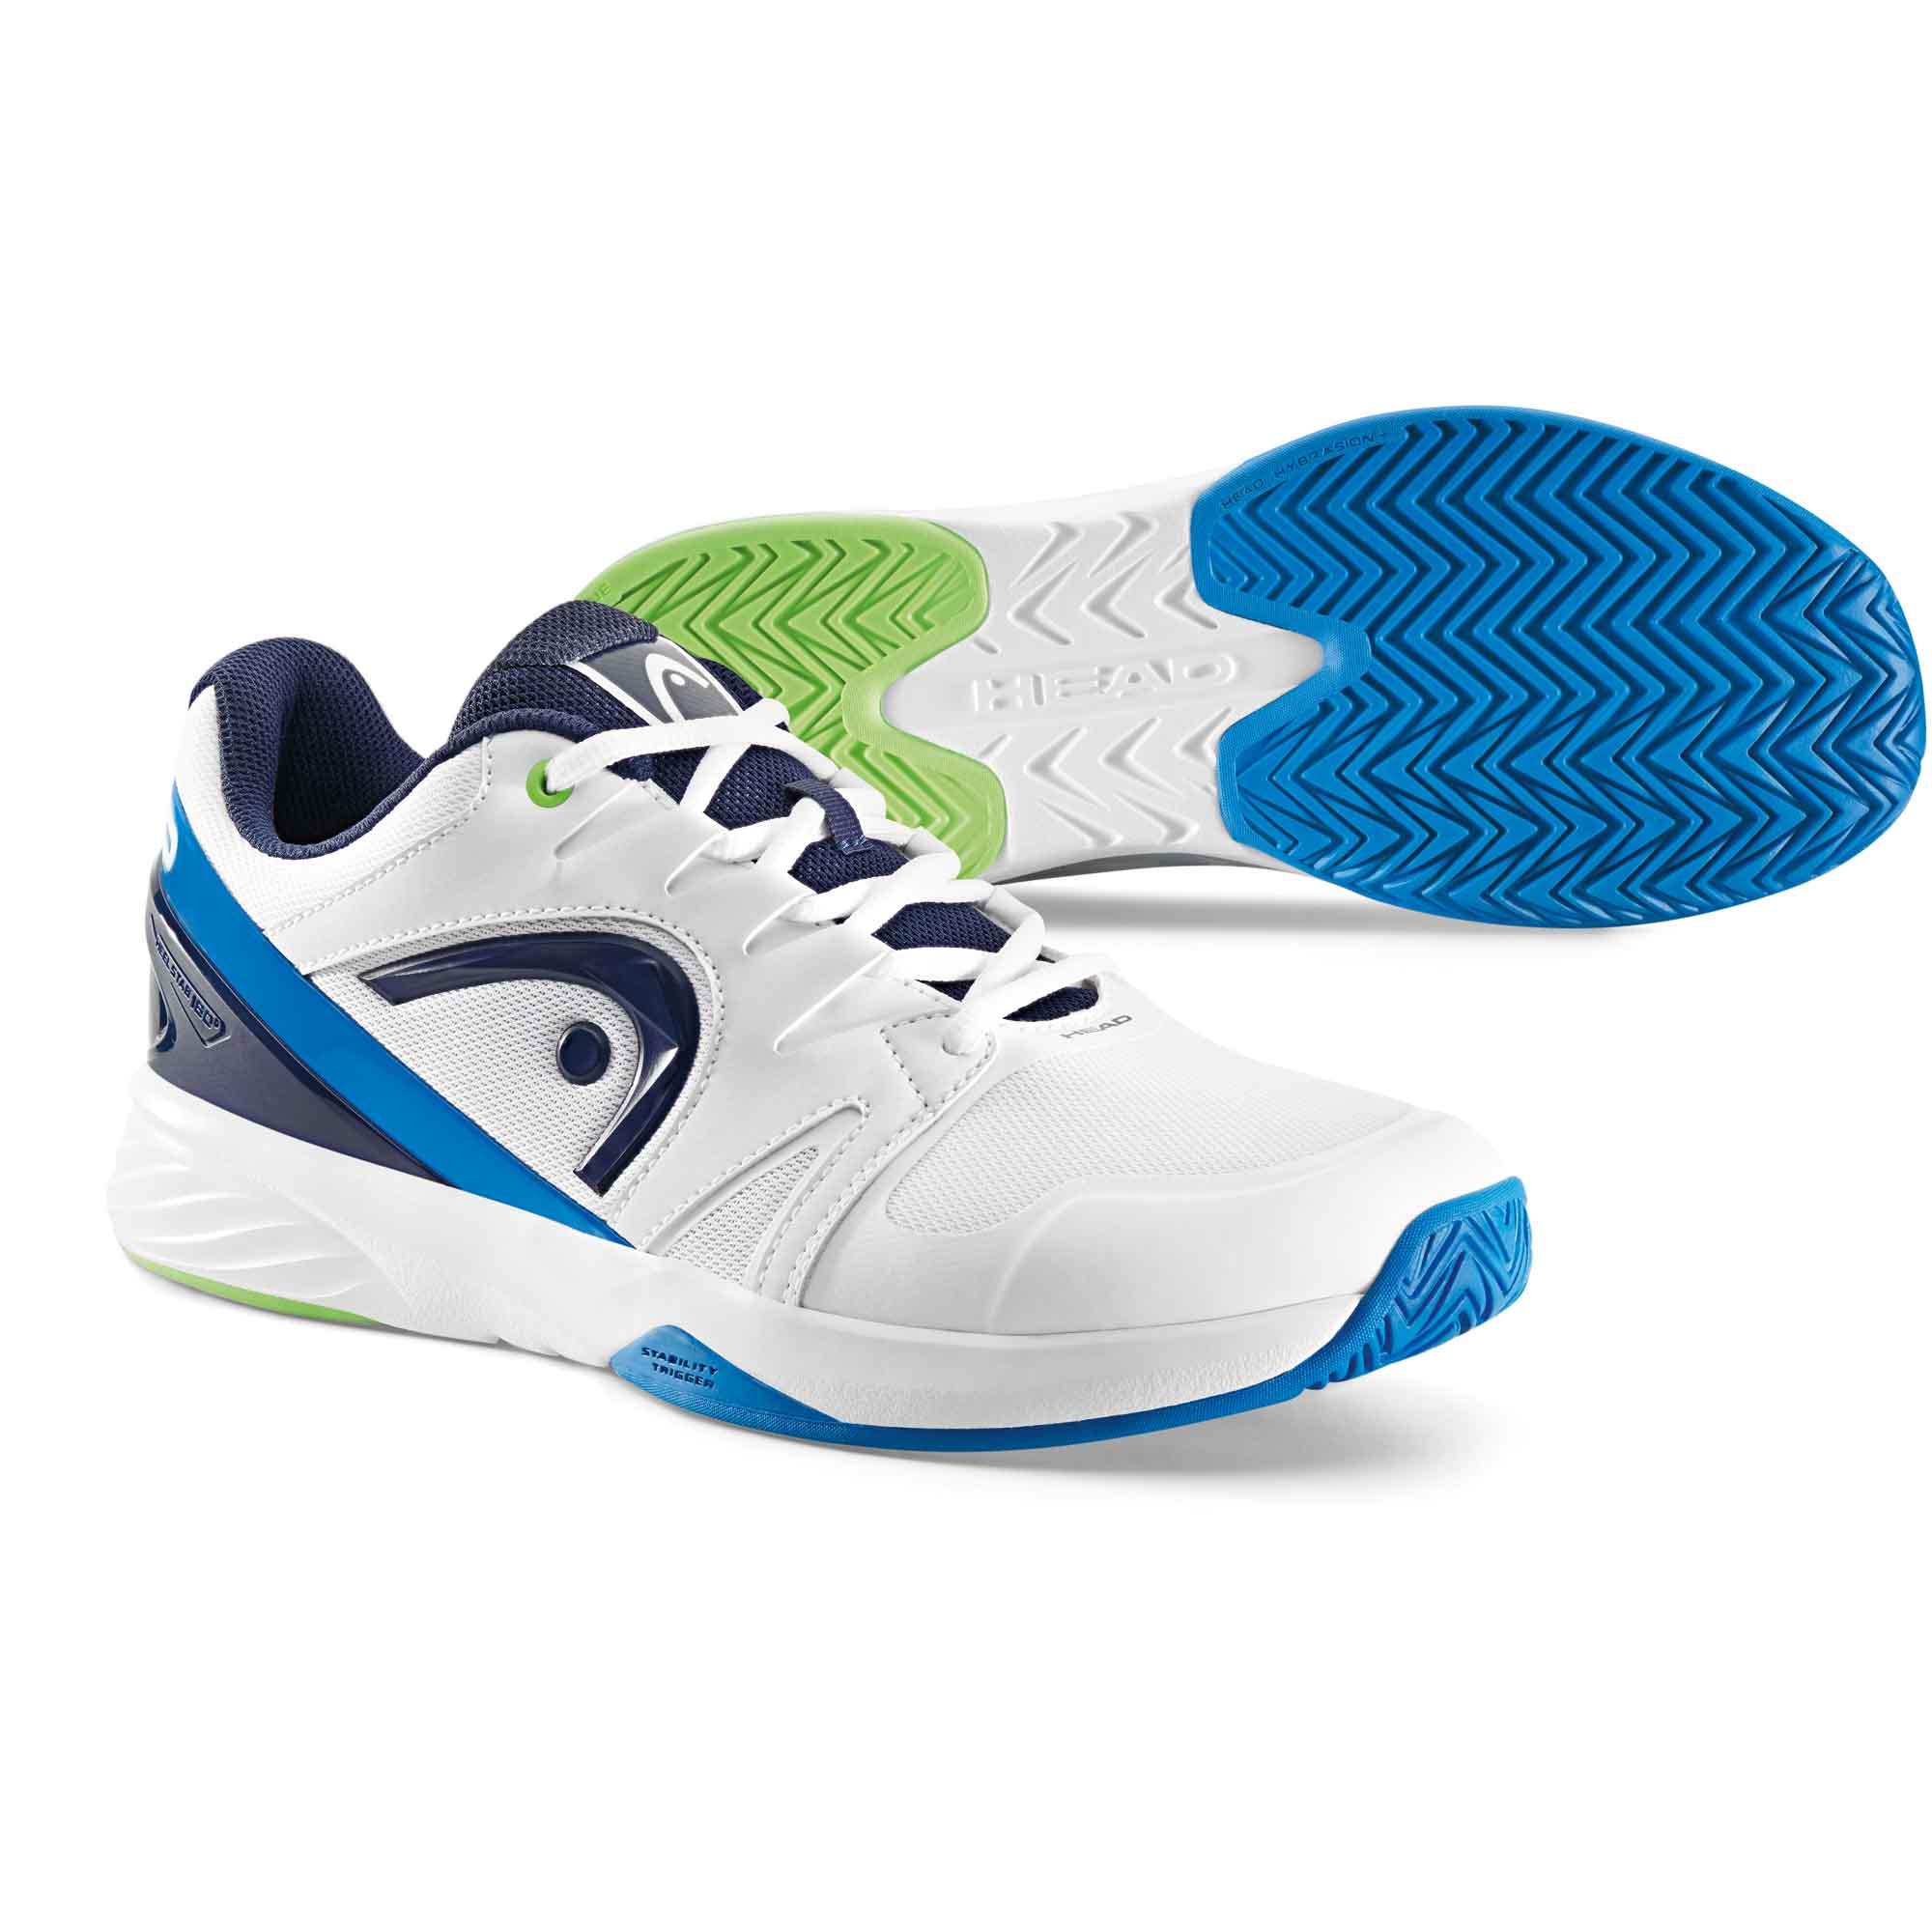 Head Nitro Team Mens Tennis Shoes  7.5 UK